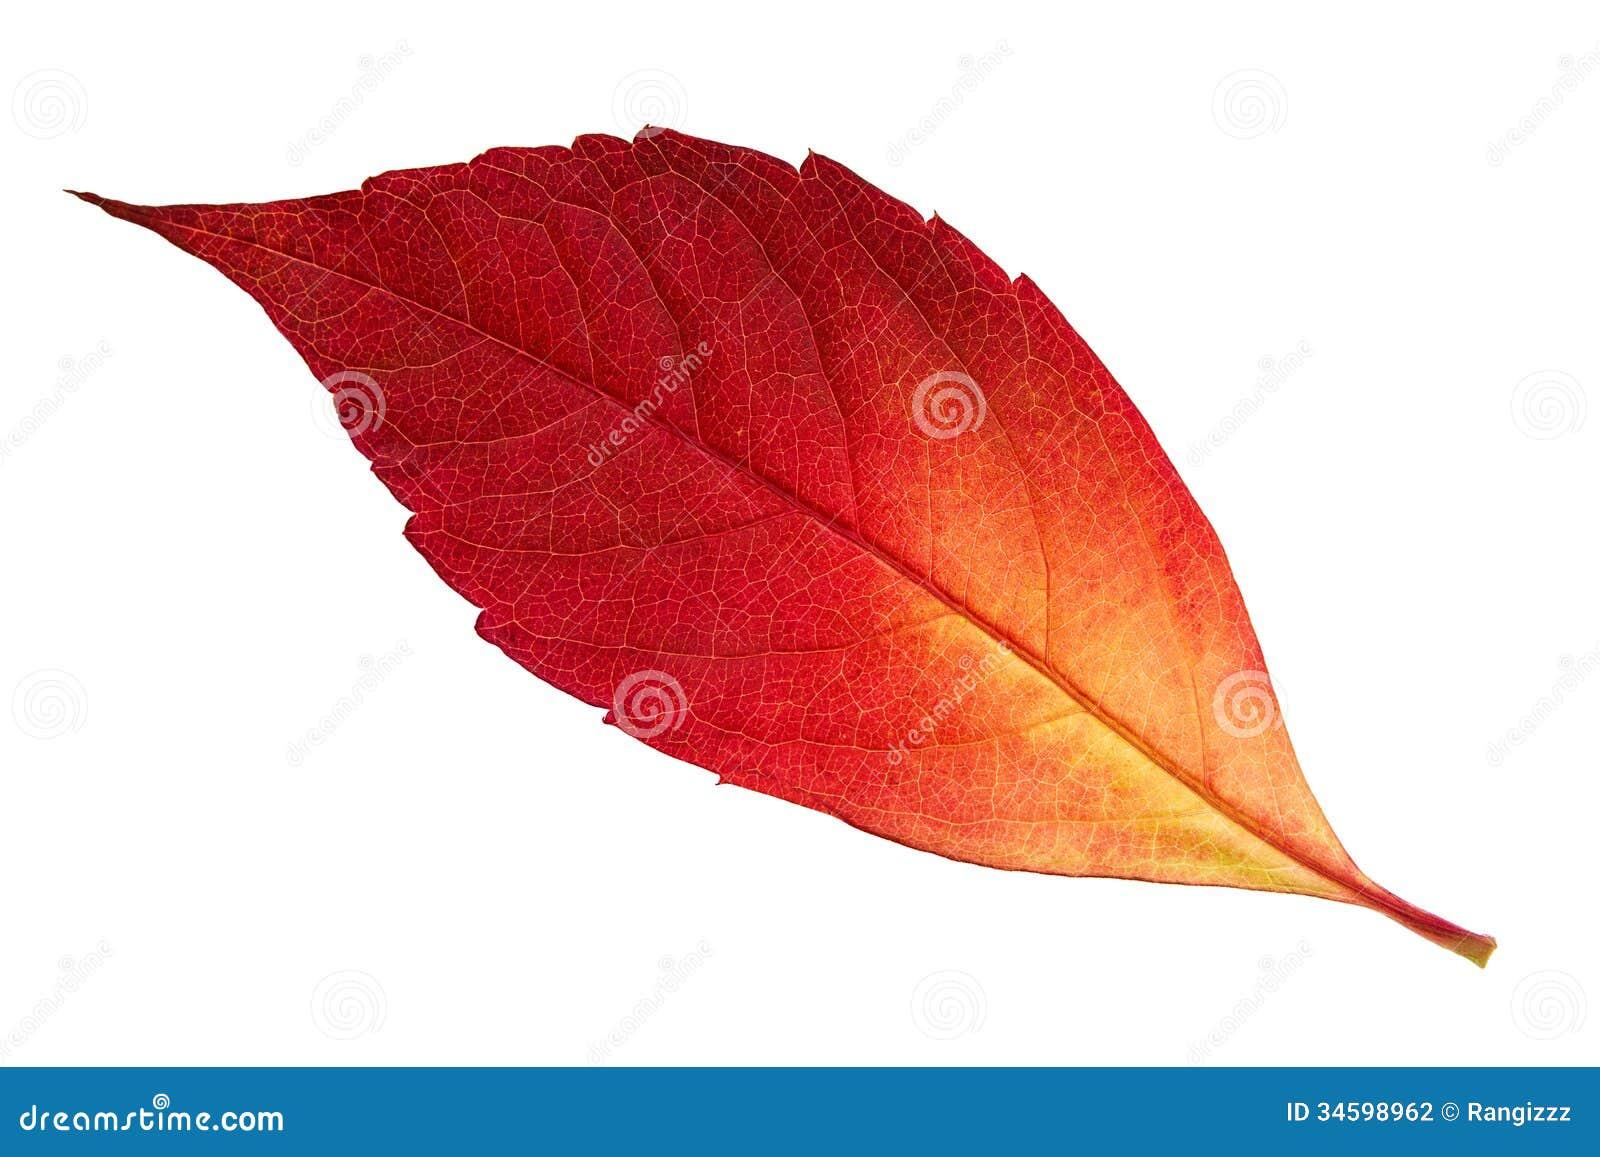 Close up of autumn leaf isolated on white background.